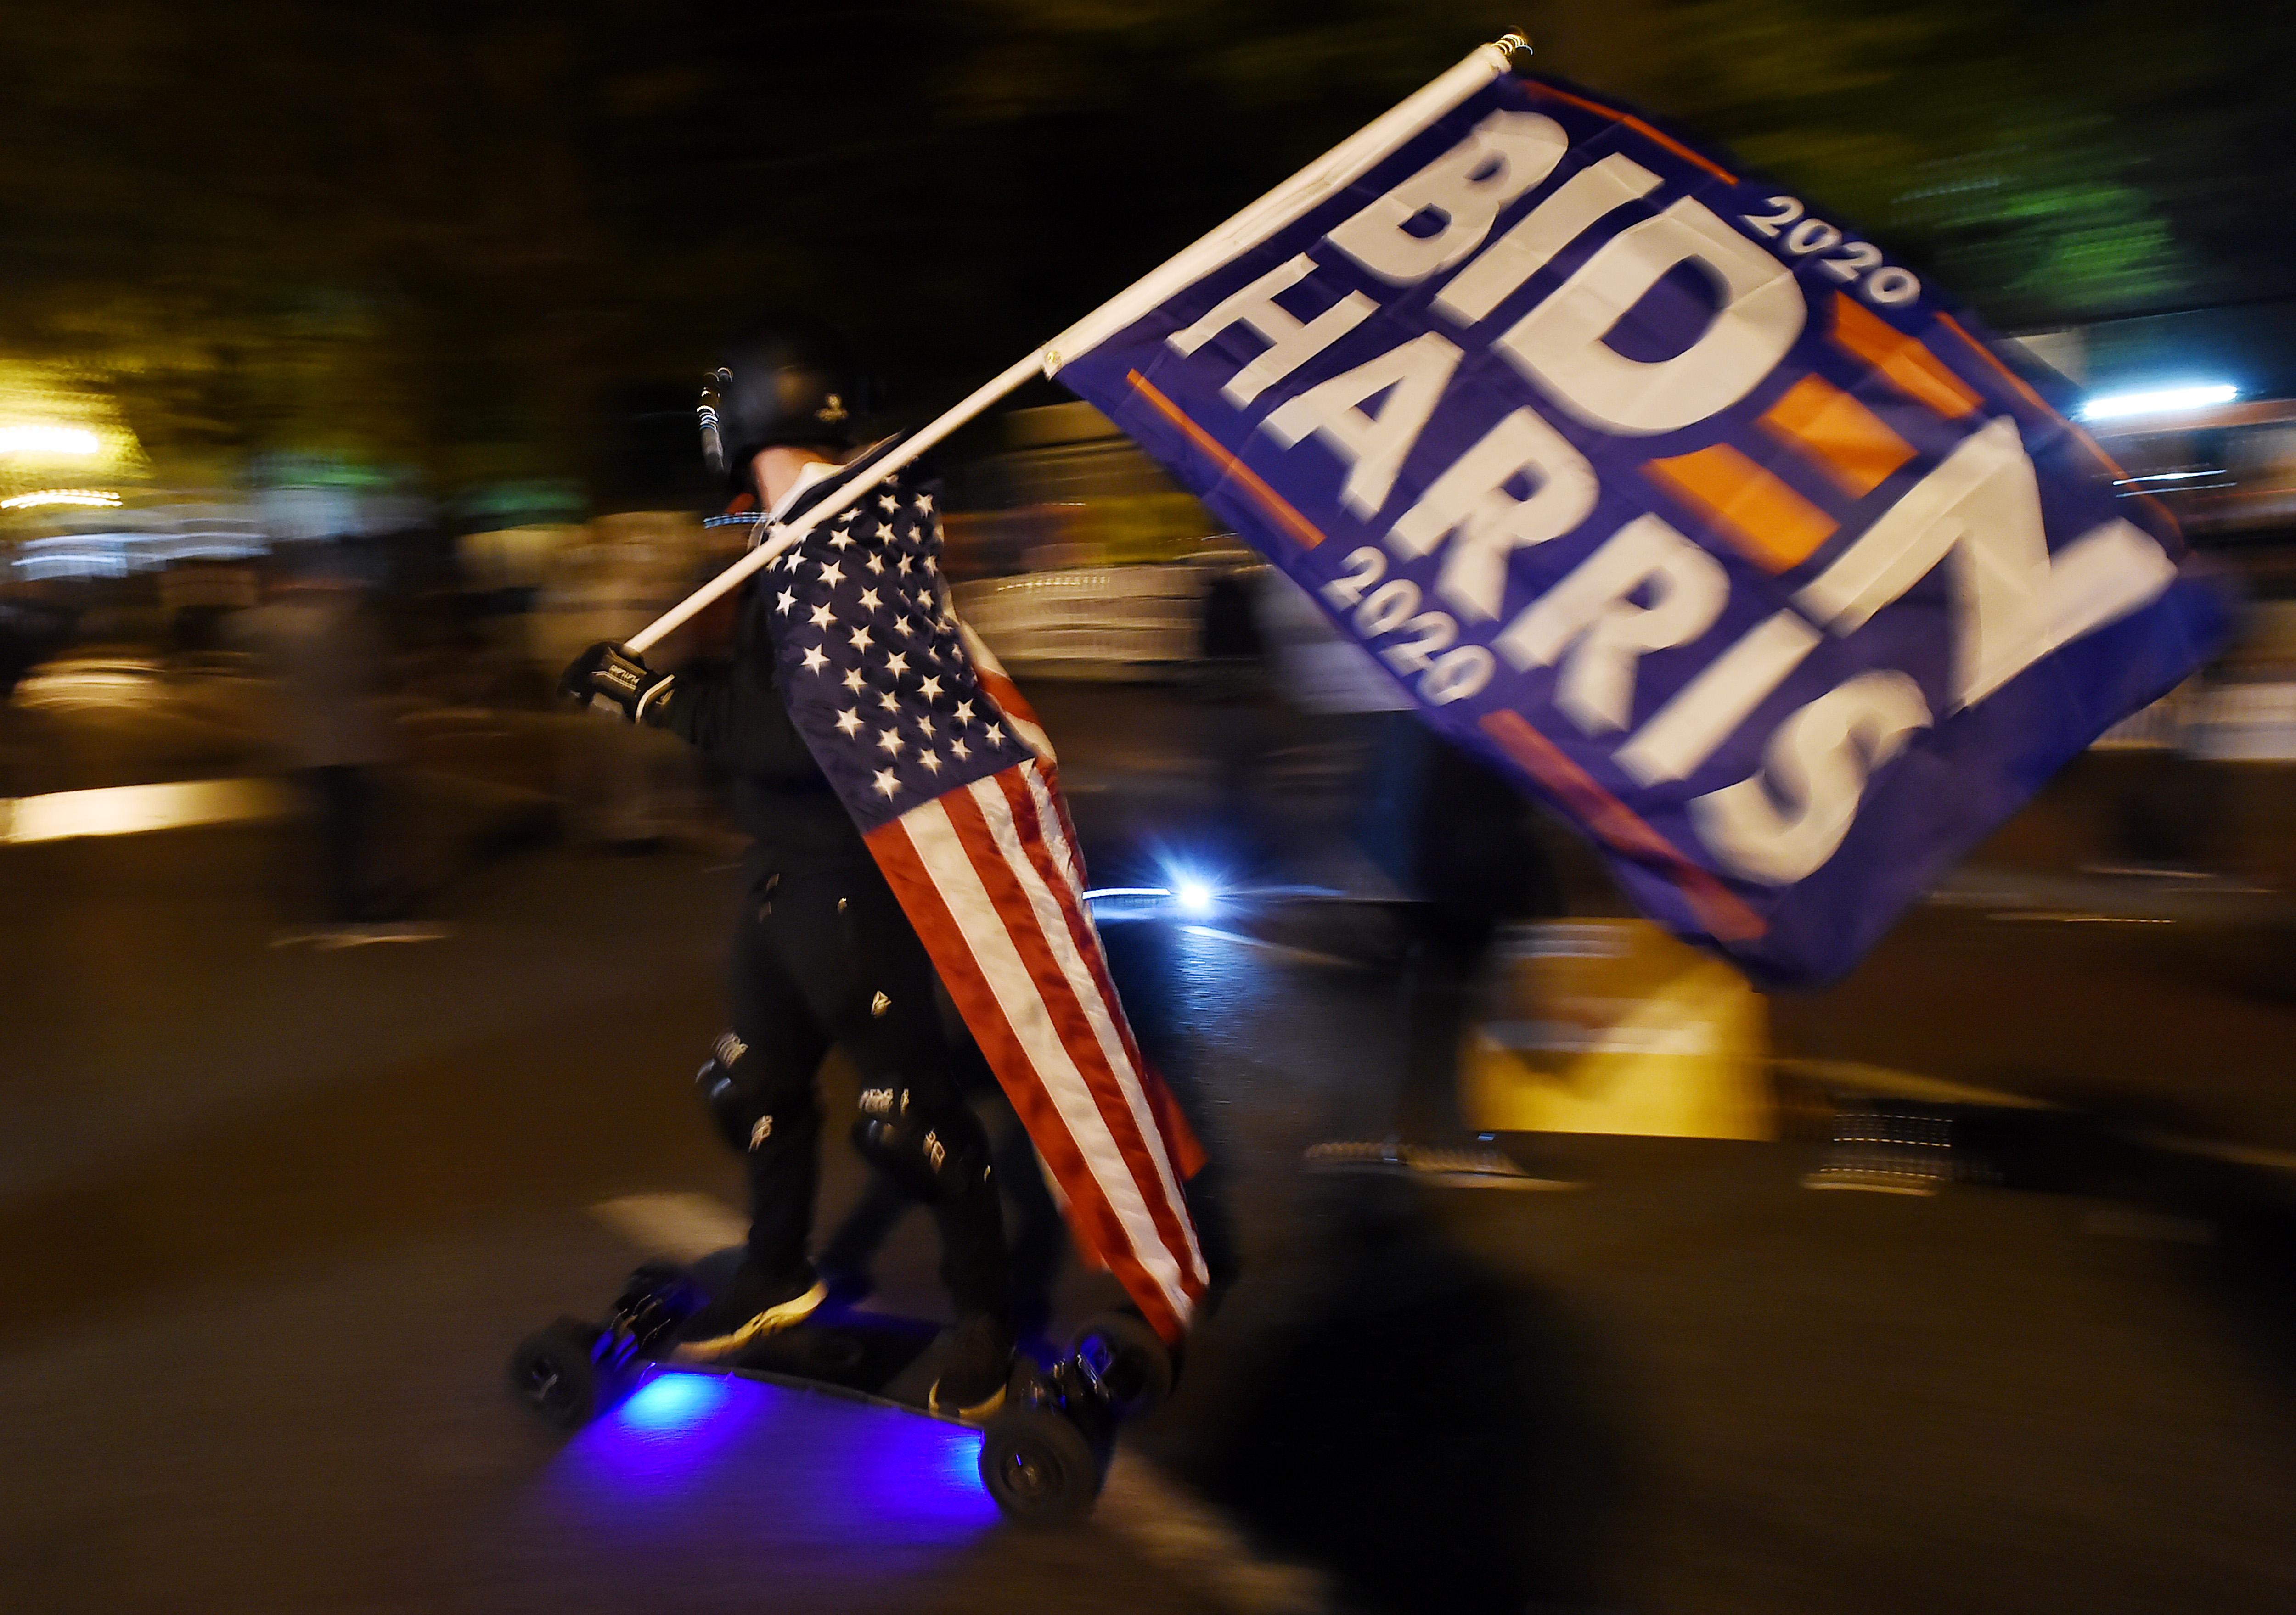 Biden pulls ahead of Trump in Georgia, votes still to count: US media